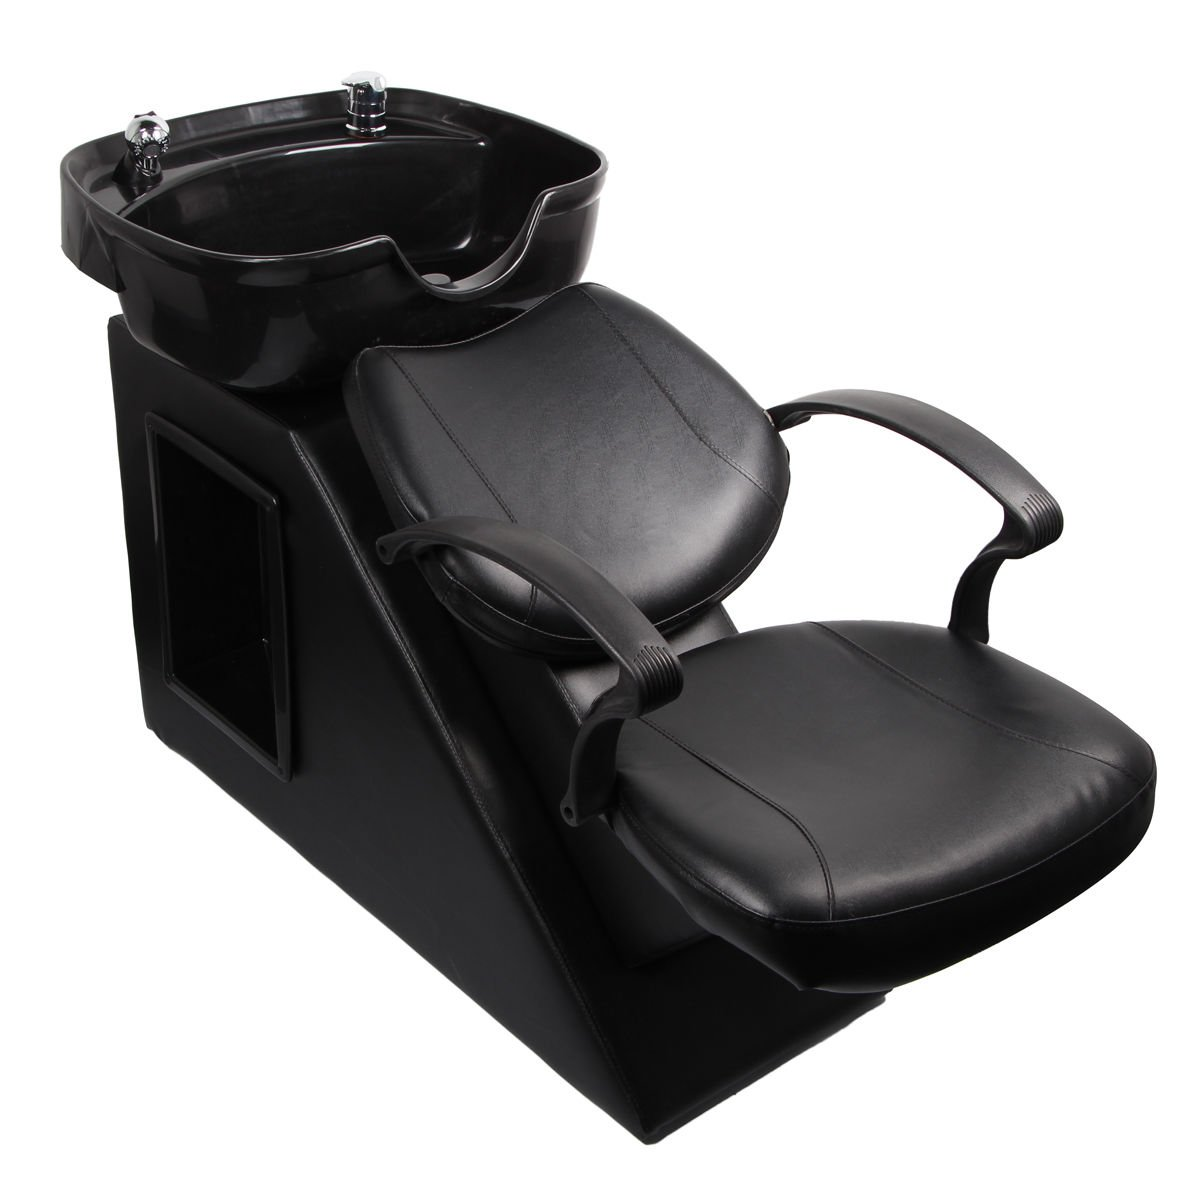 Tek Widget Salon Backwash Shampoo Chair with Sink Bowl